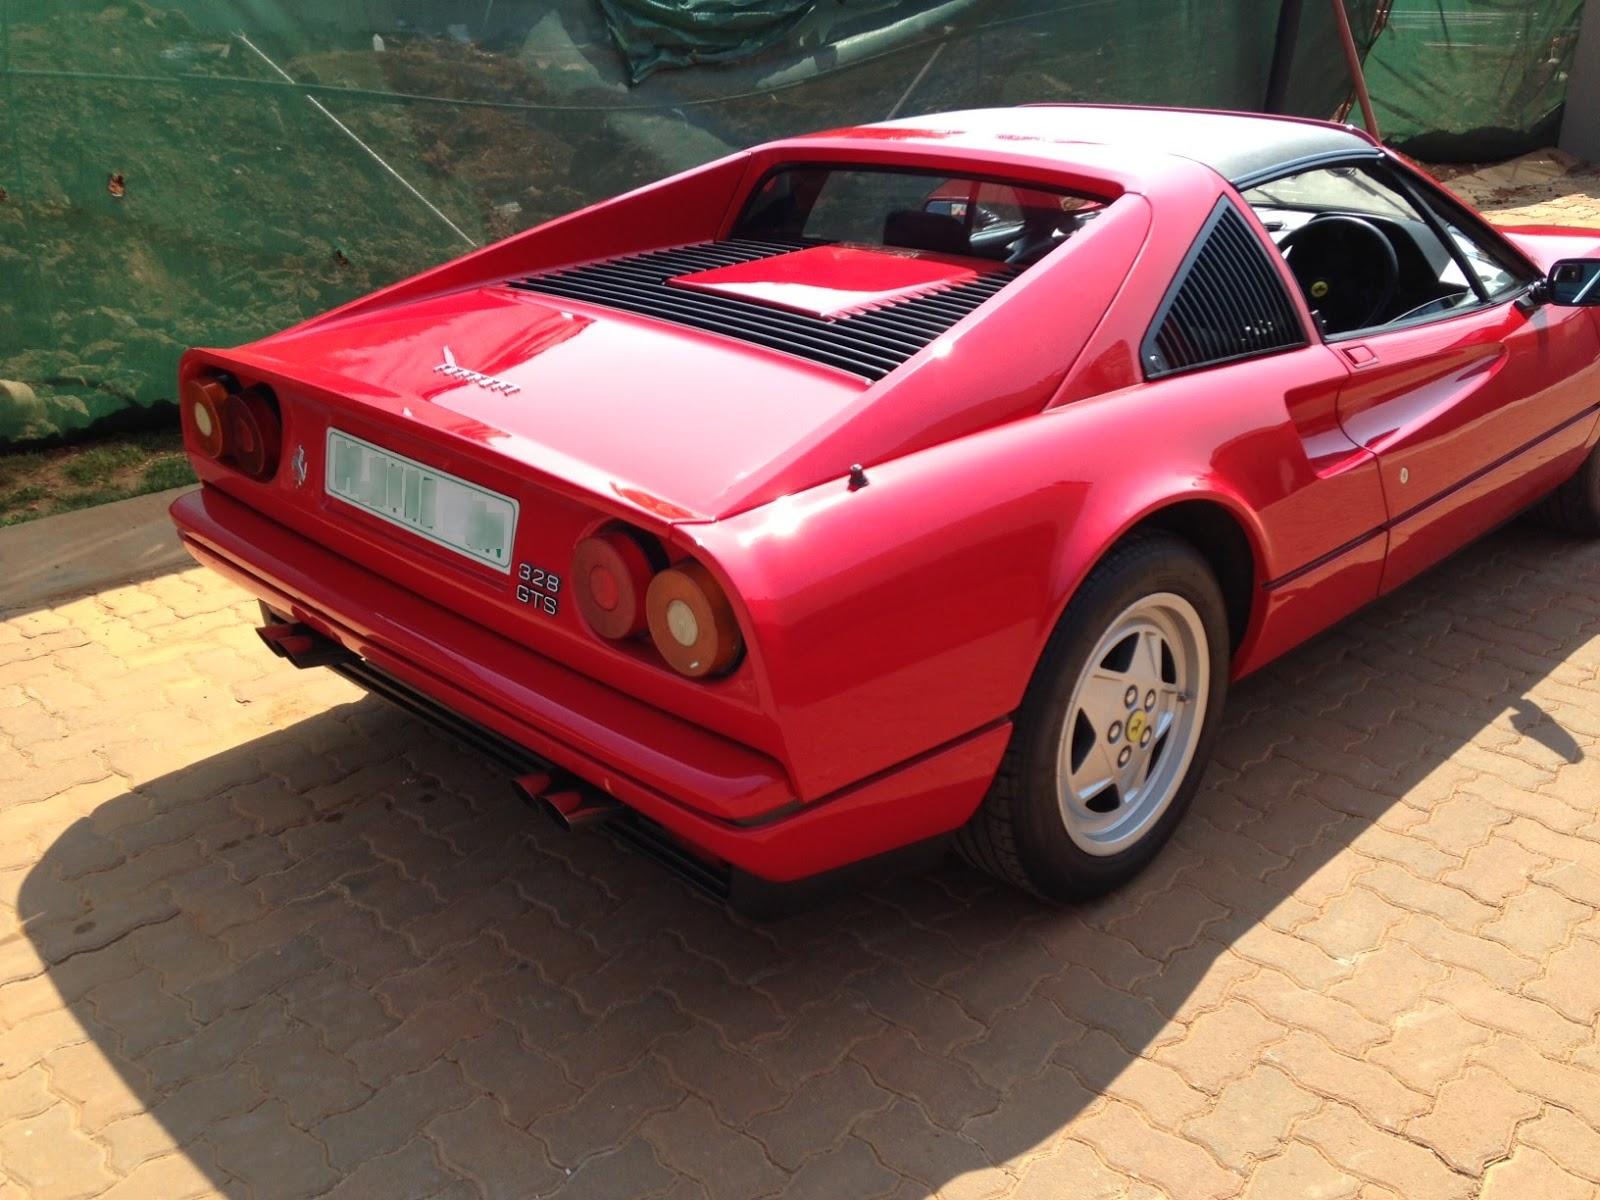 driven-ferrari-328-gts-south-africa-zero2turbo-classic+(8) Outstanding Ferrari Mondial 8 Sale south Africa Cars Trend